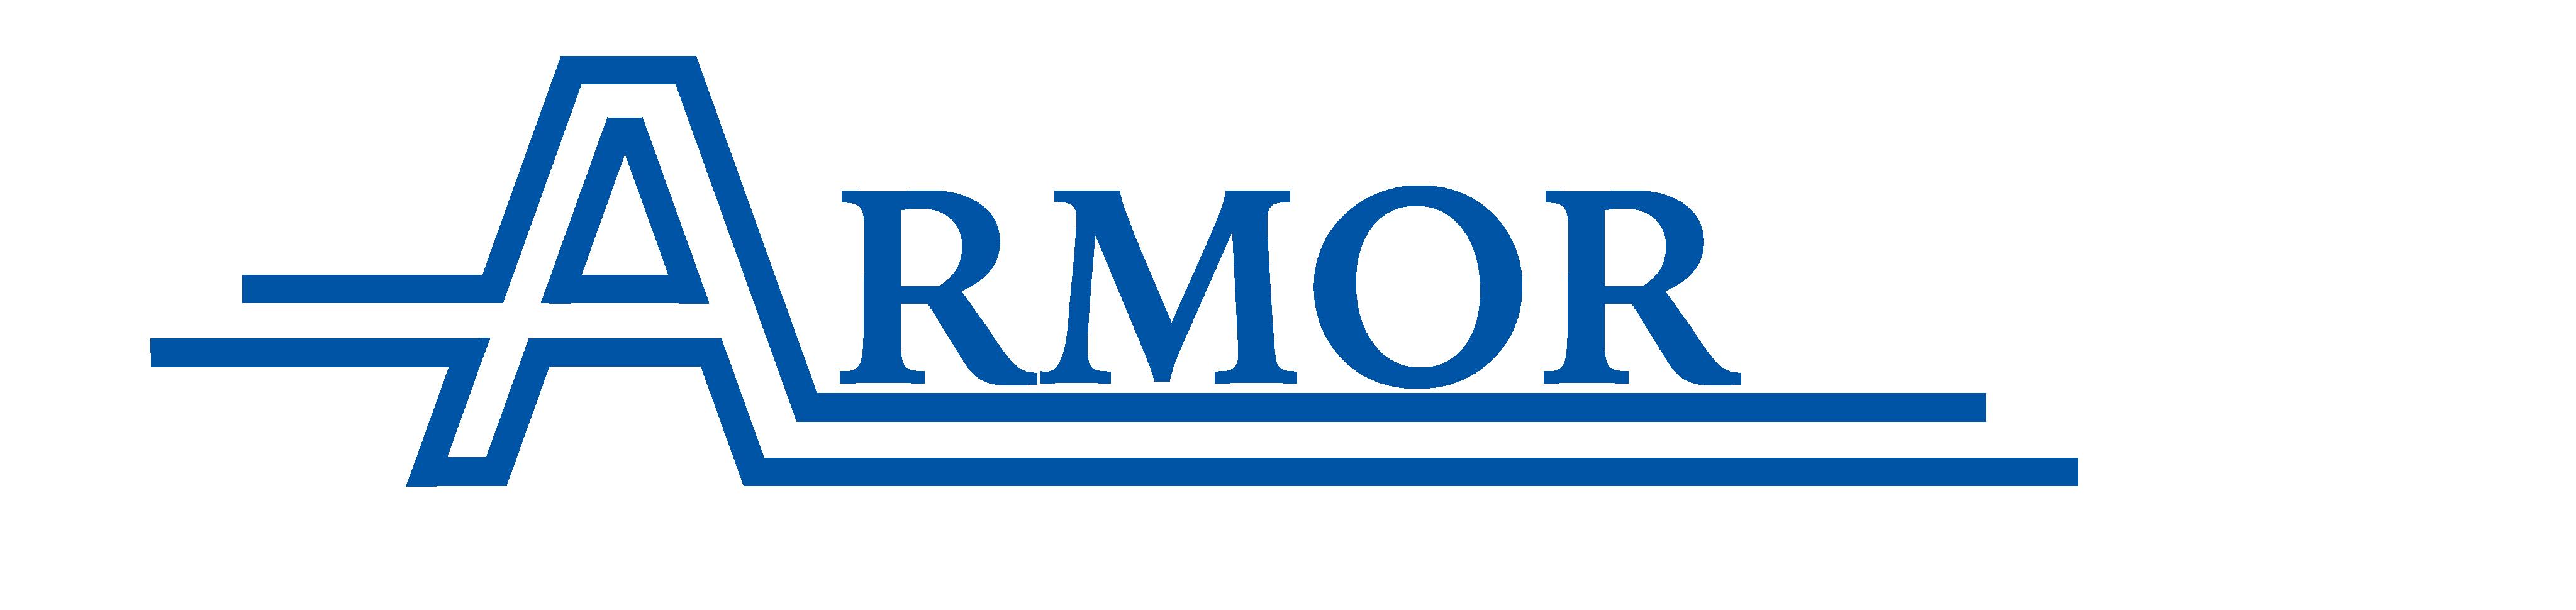 Armor Industries